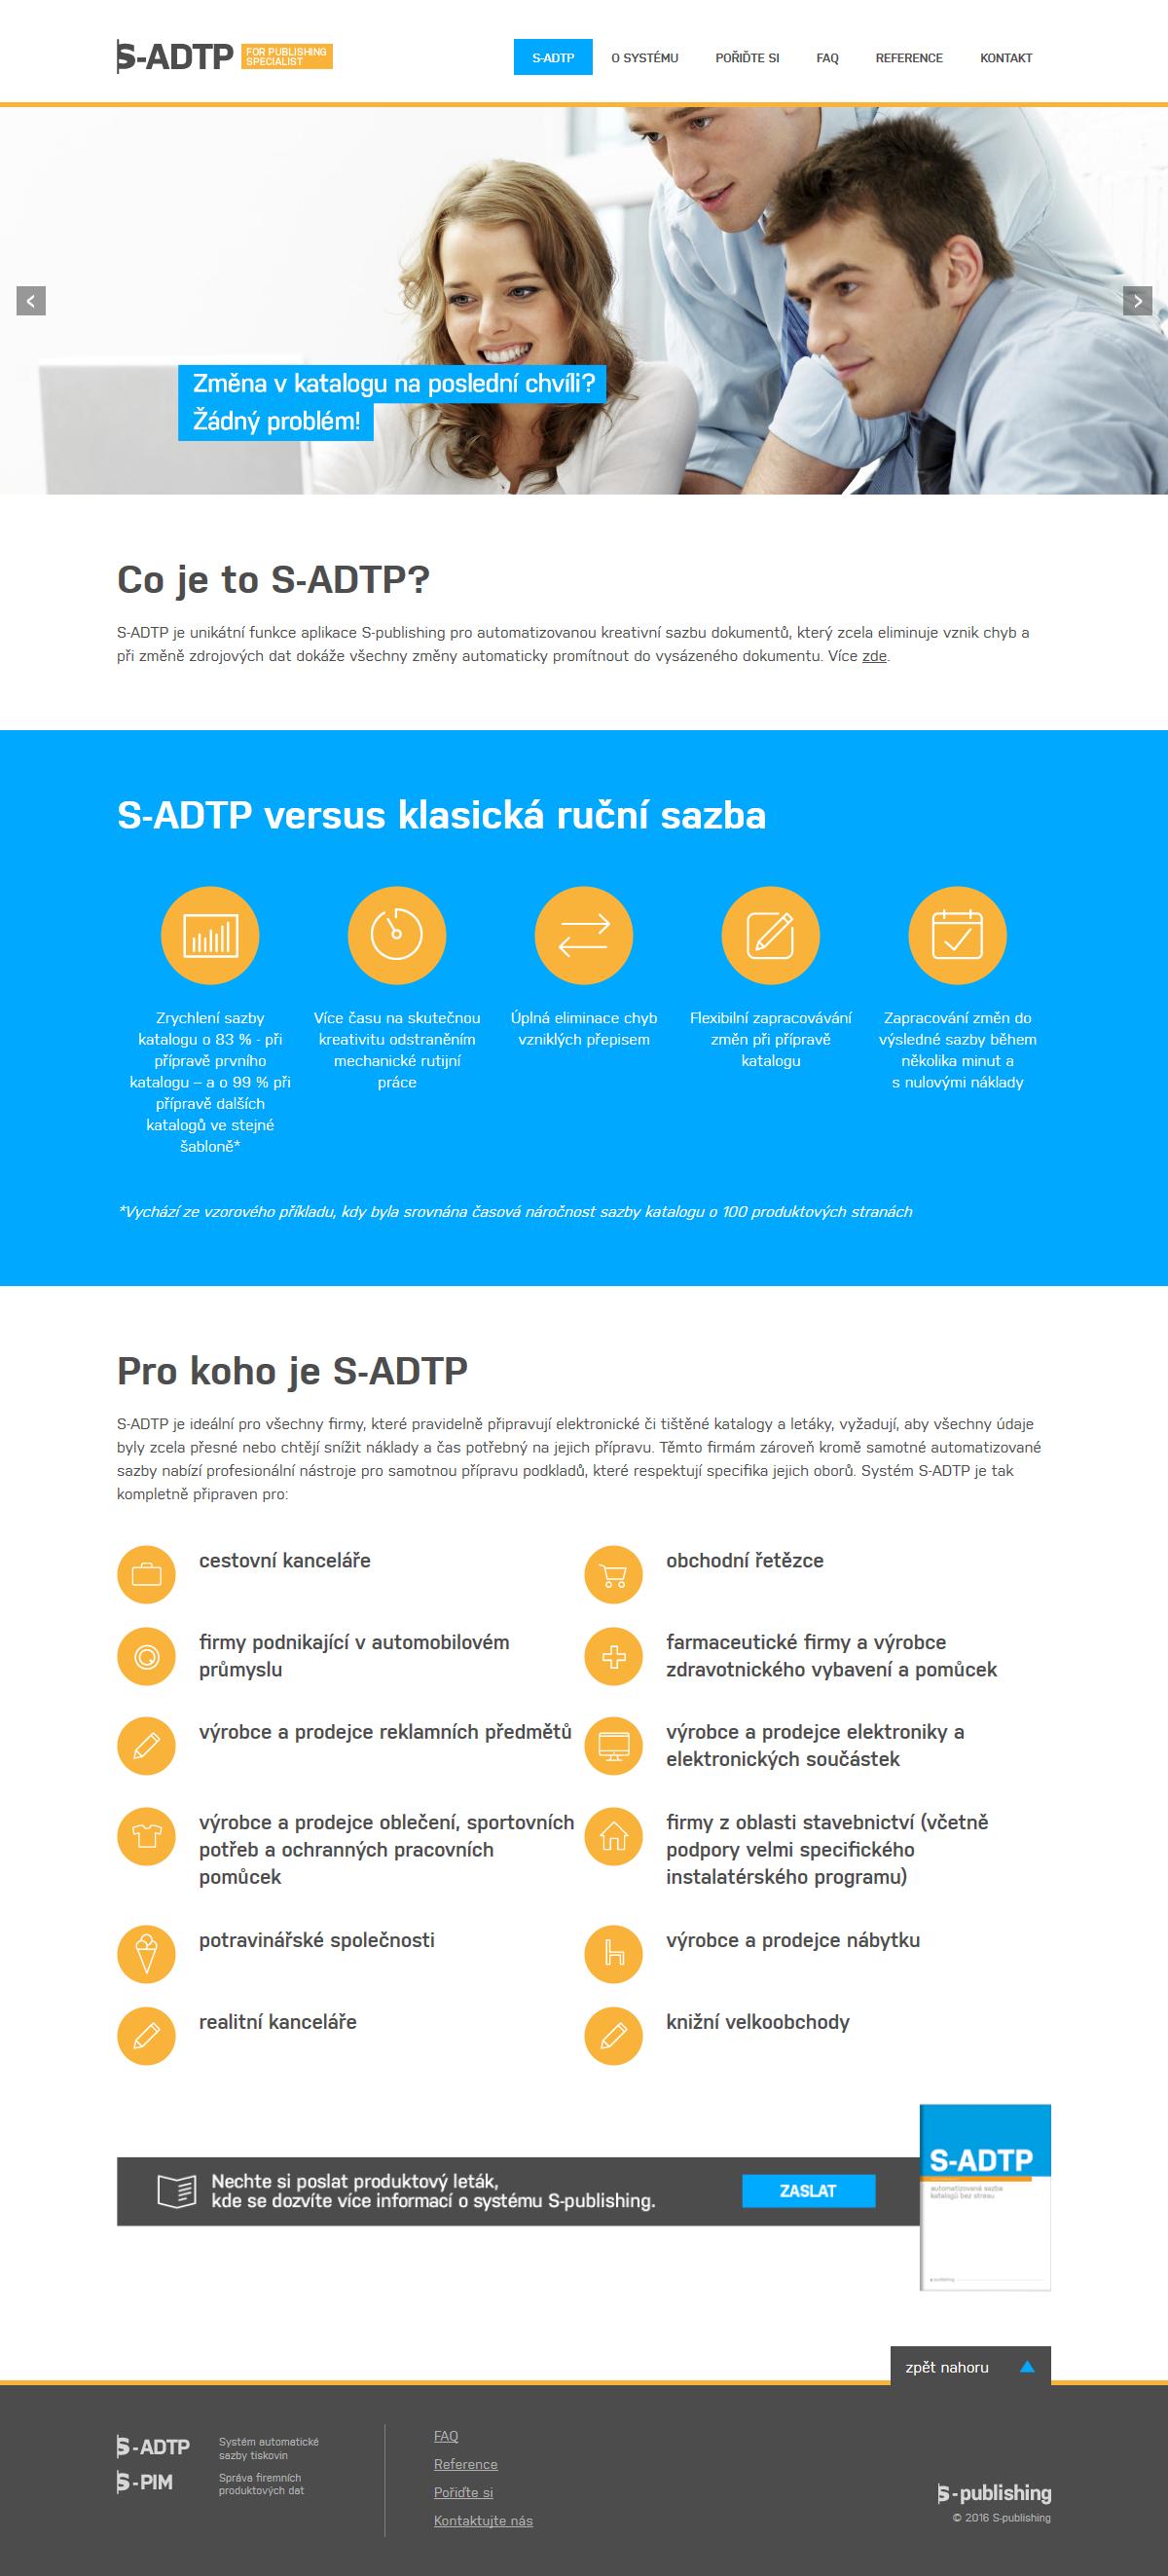 S-ADTP